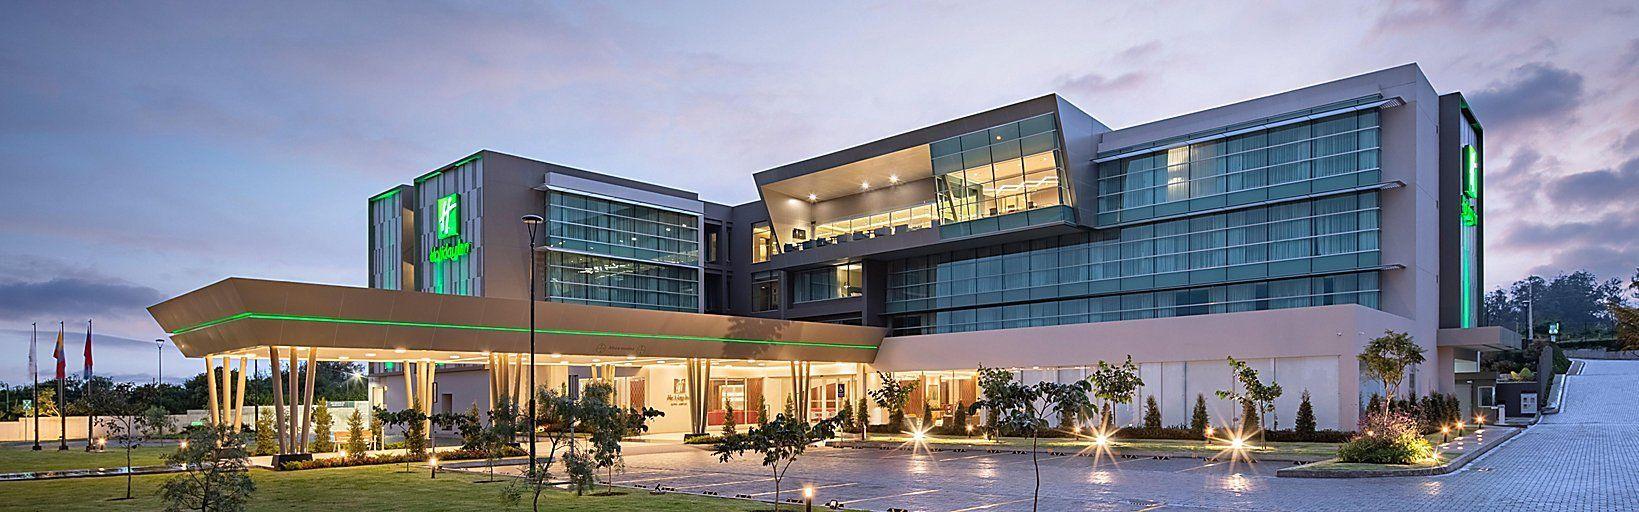 Holiday Inn Quito